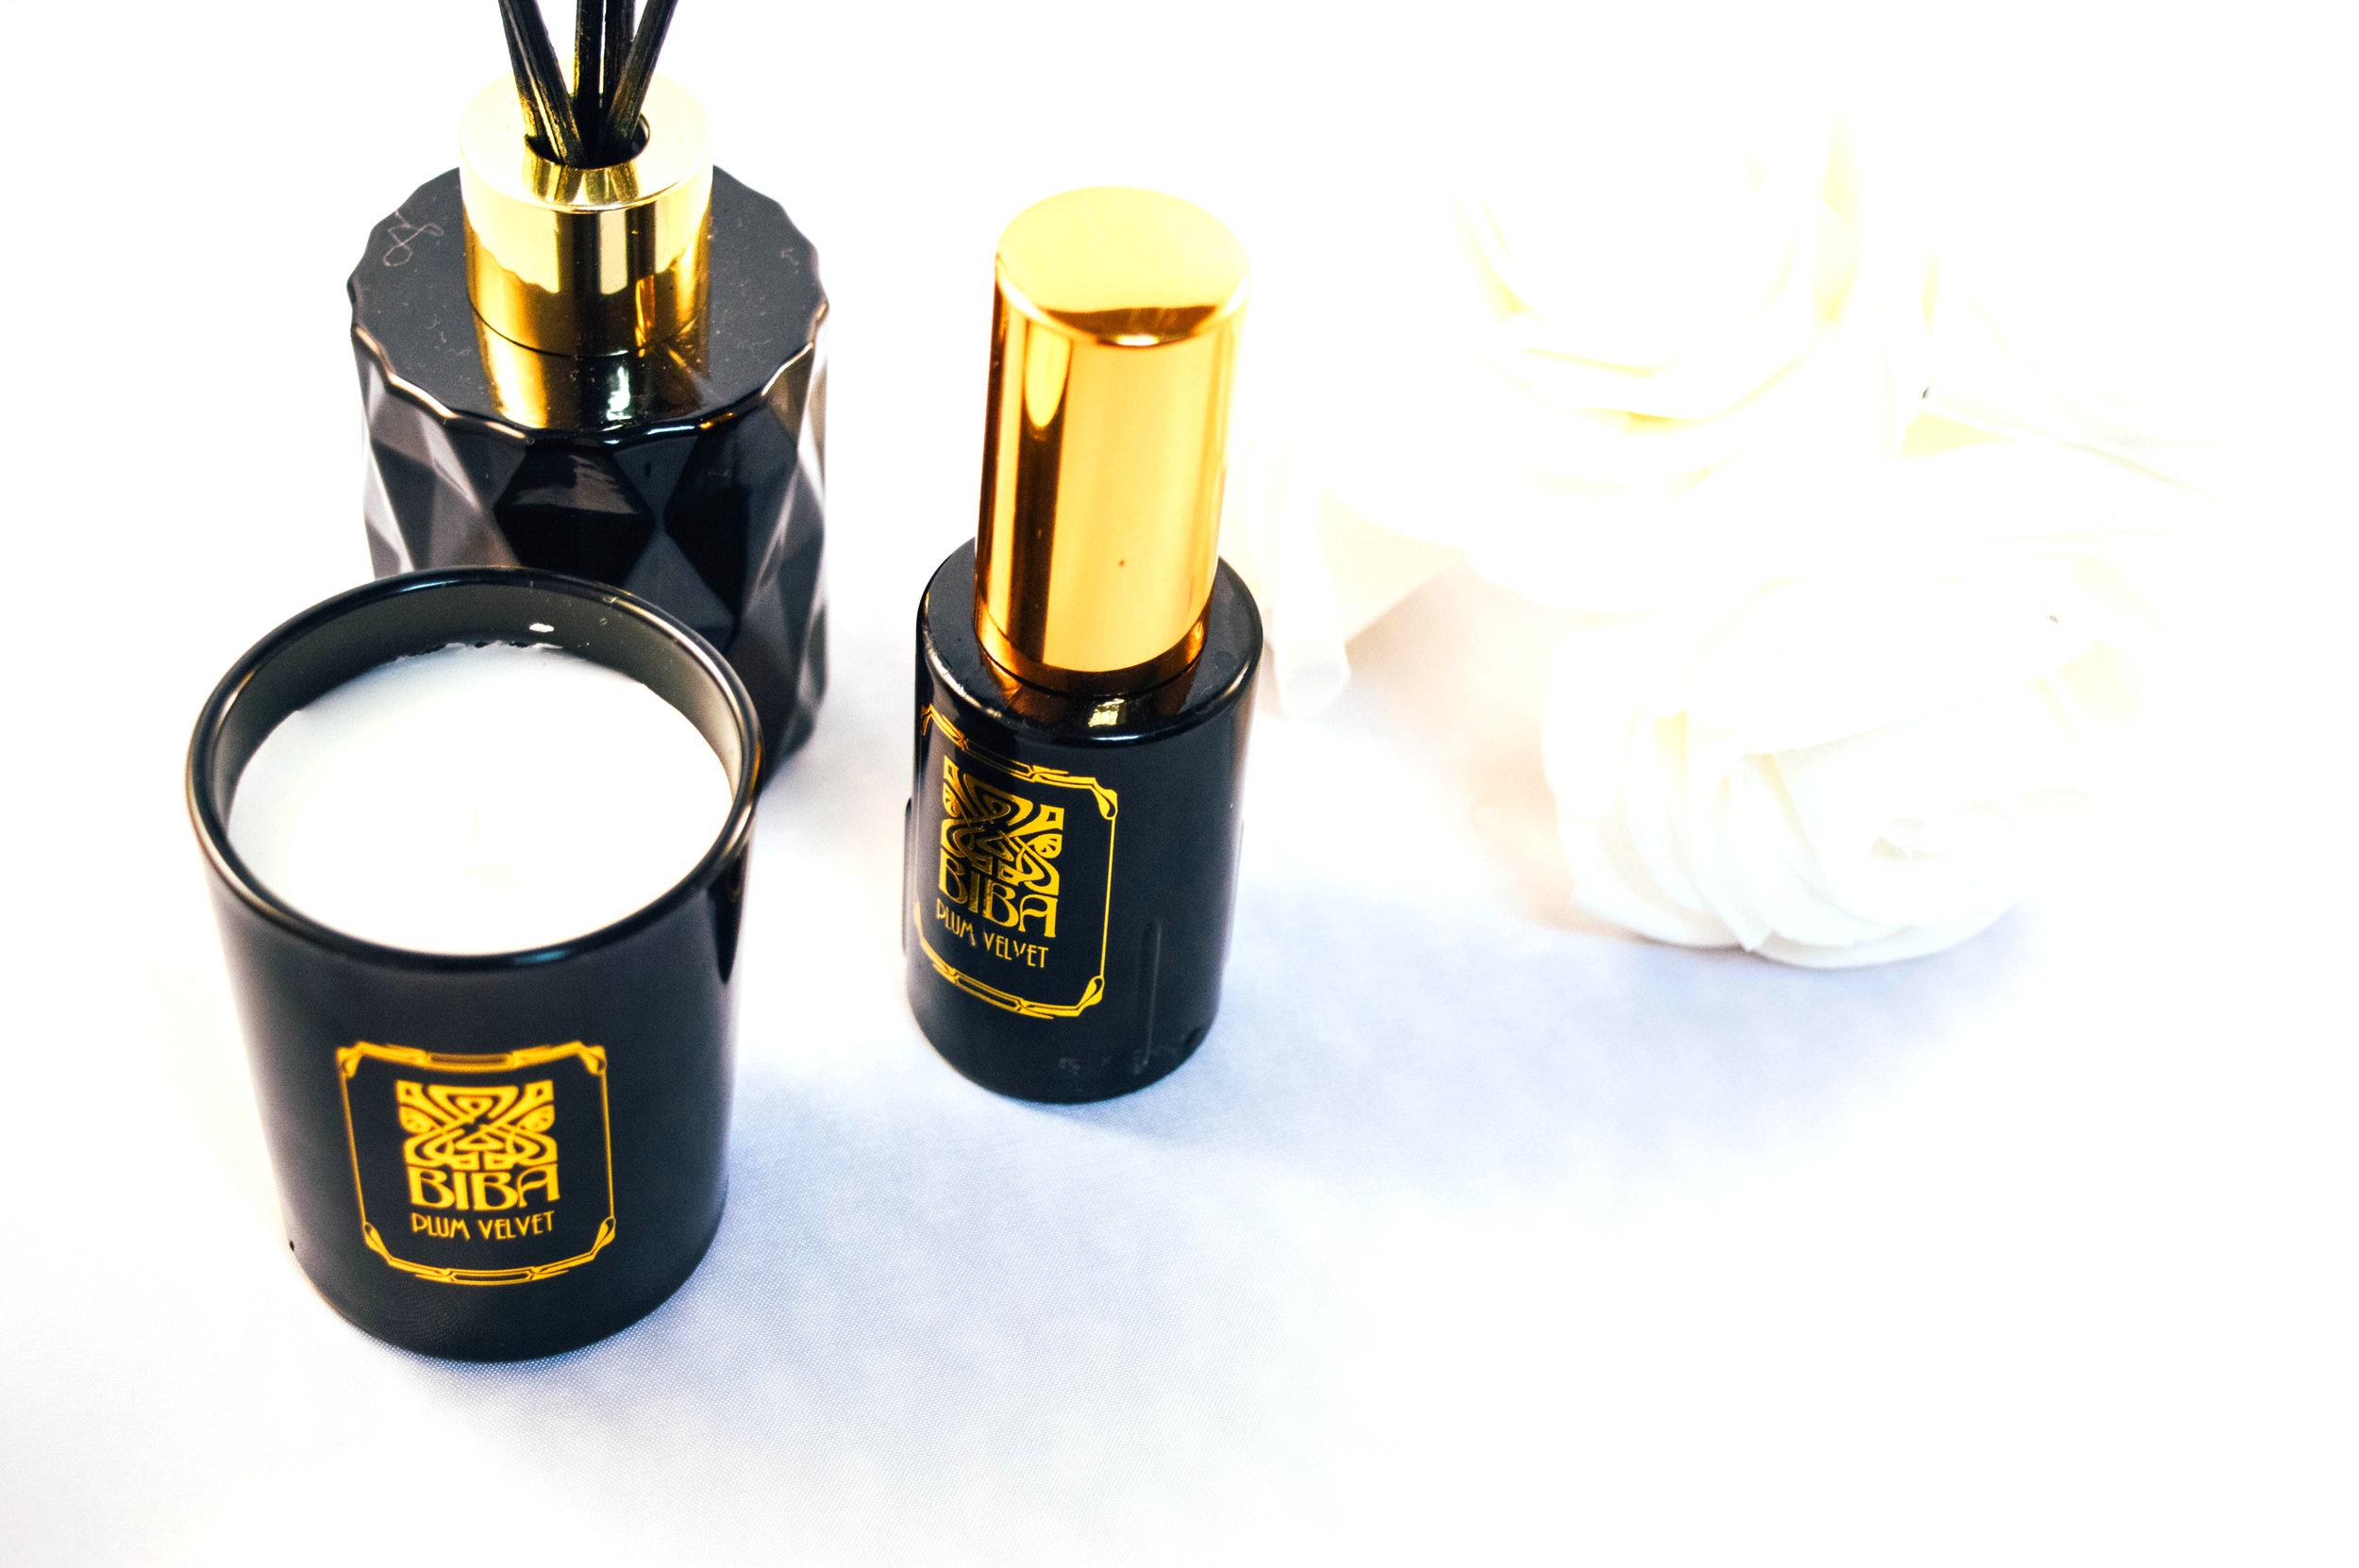 Biba home diffuser review by Minihaha